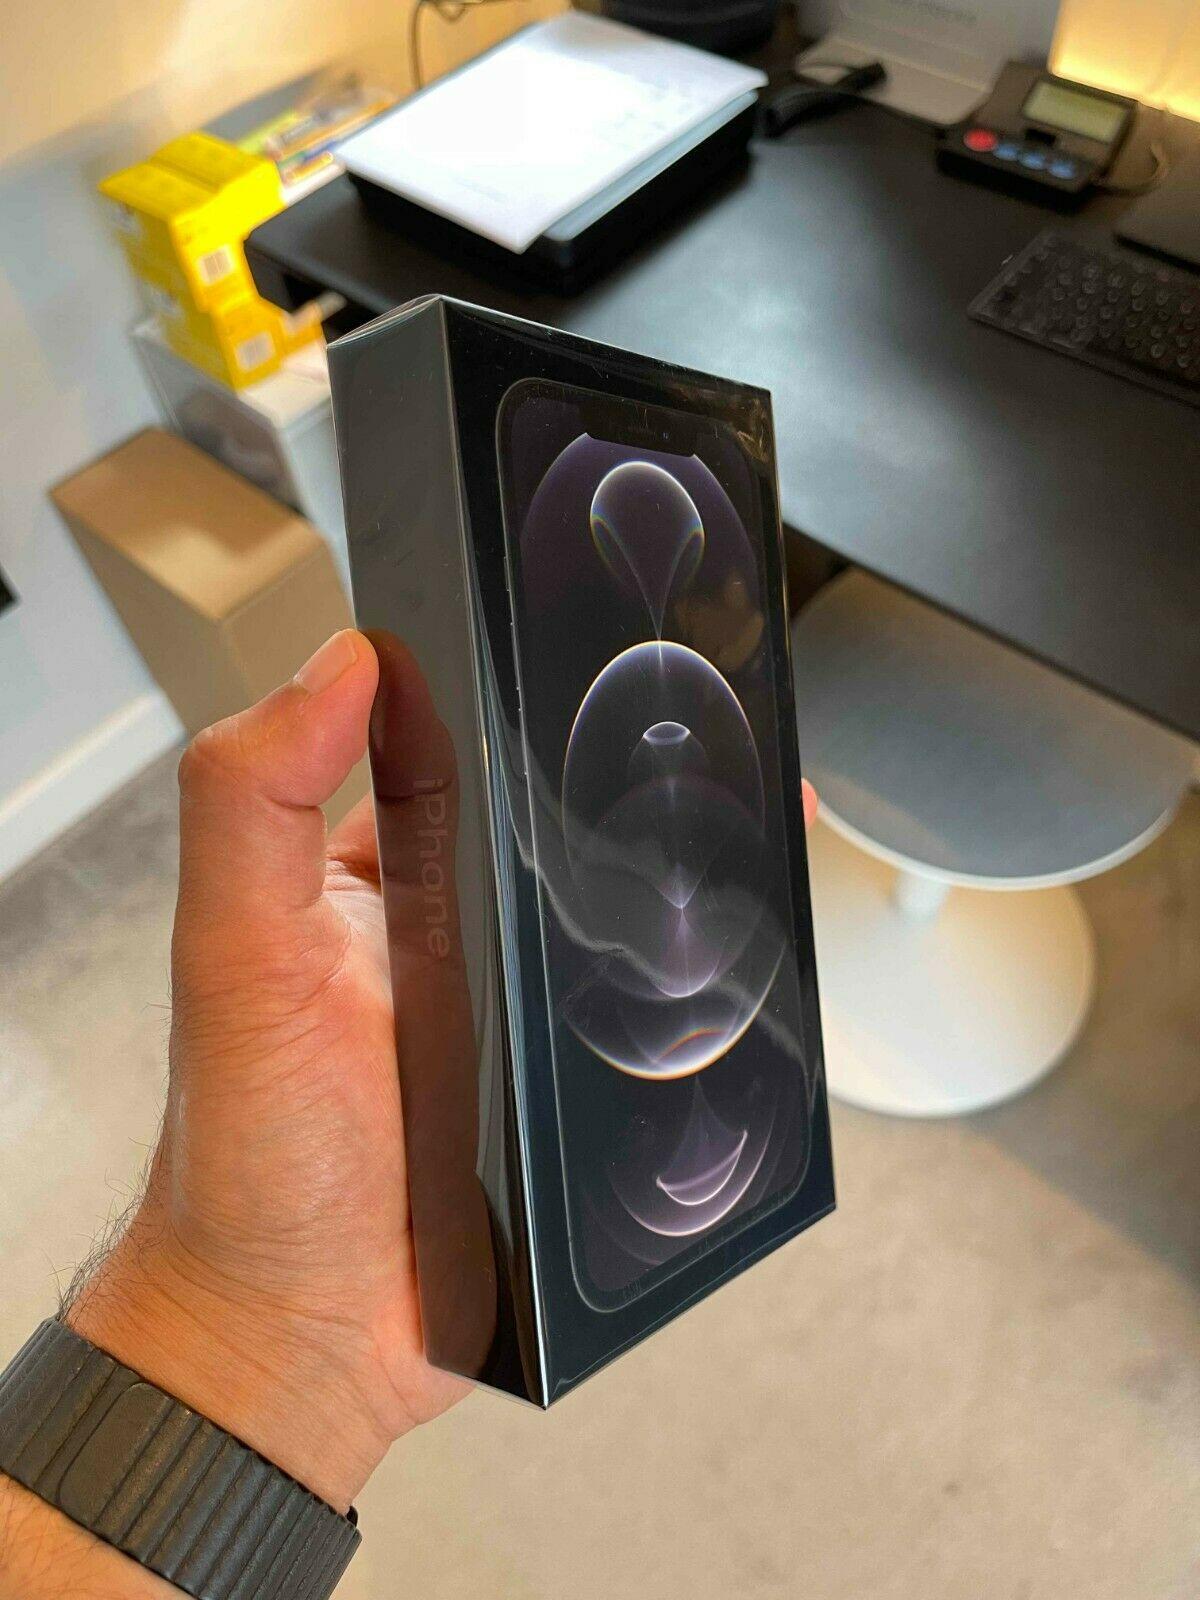 Brand new Apple iPhone 12 Pro Max 512GB